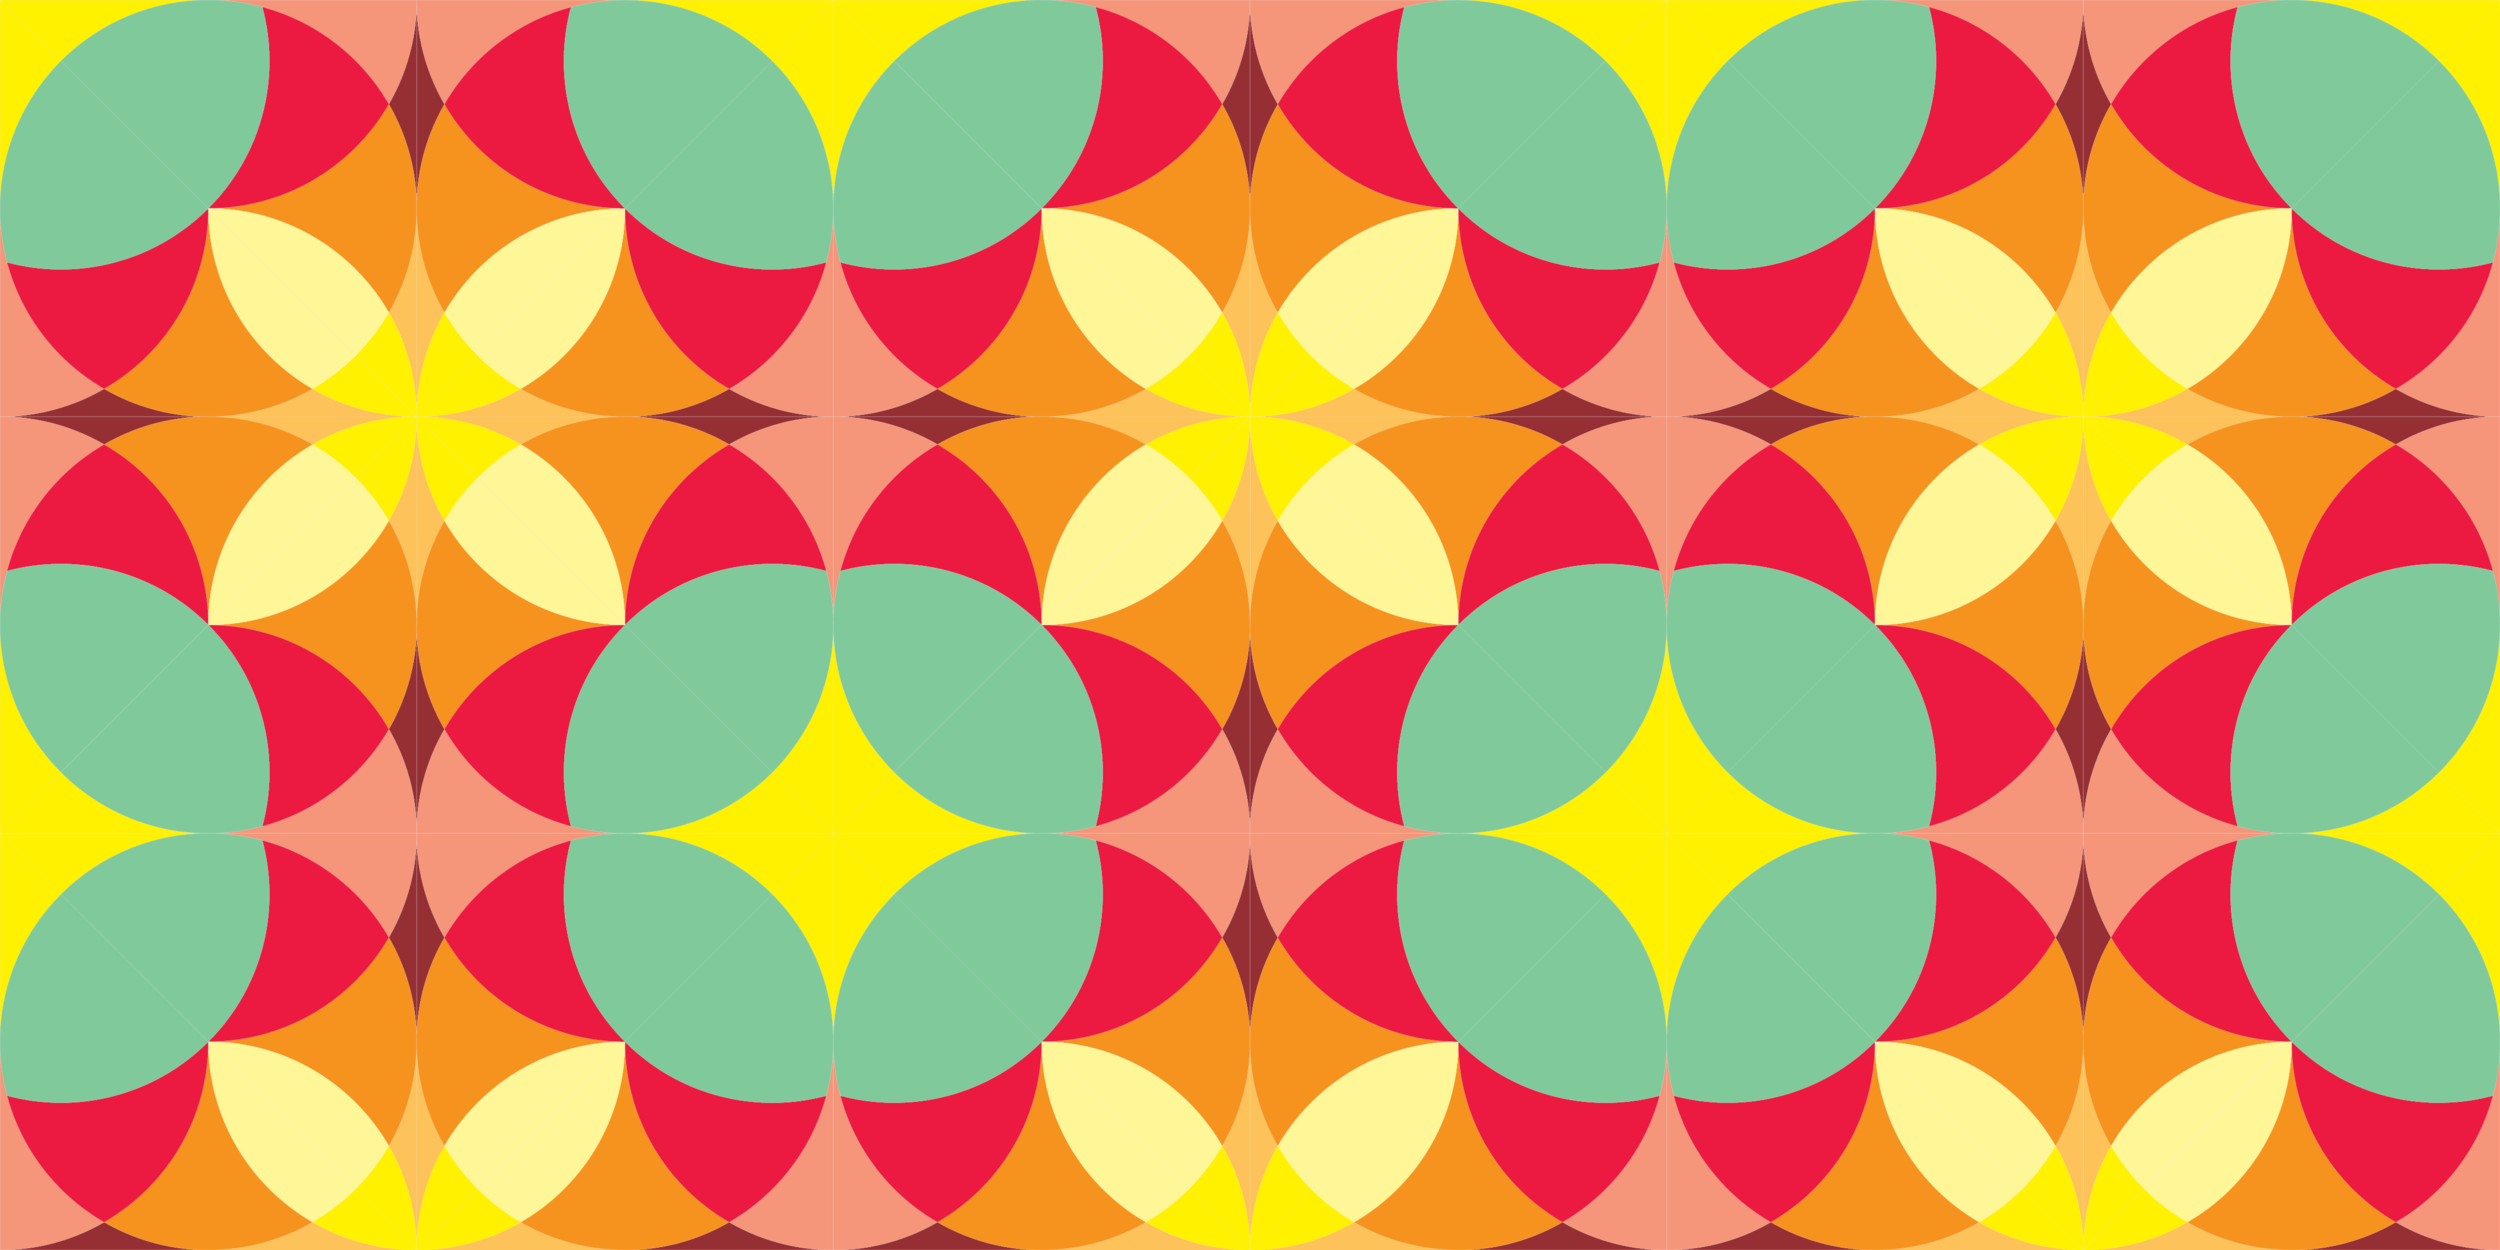 tiles_ii_0000_7.png